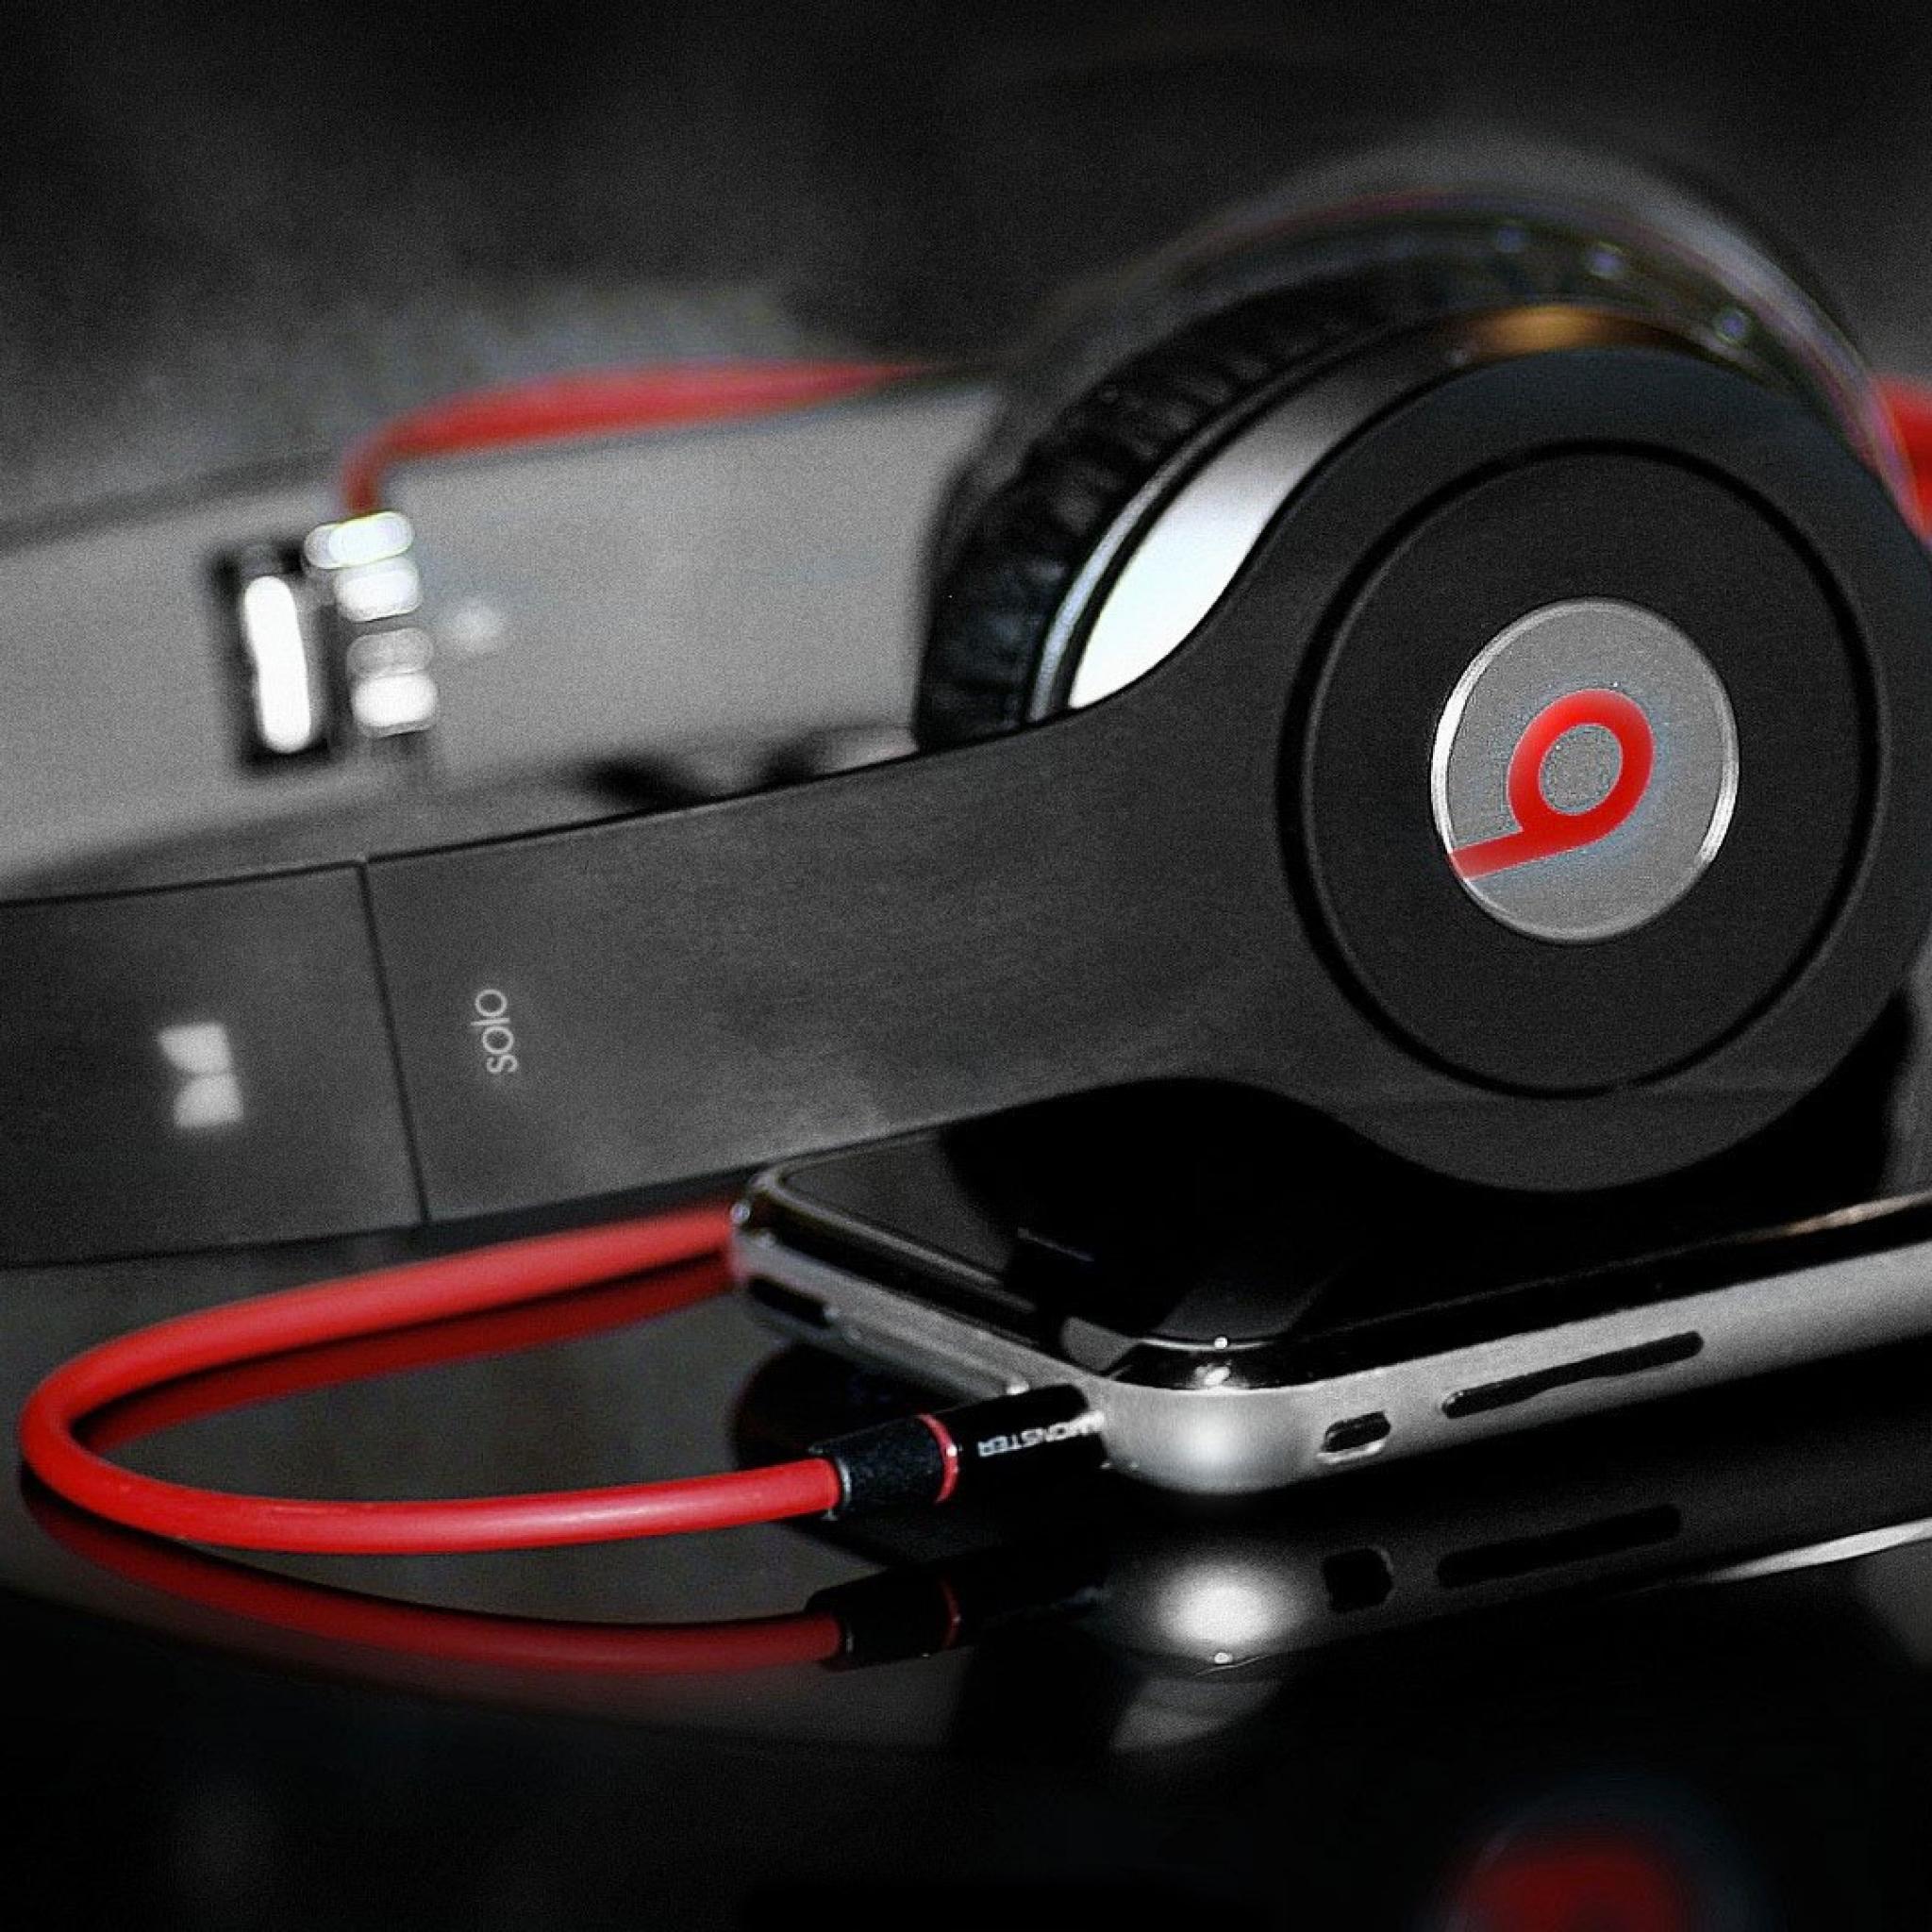 Headphones-Beats-3Wallpapers-iPad-Retina